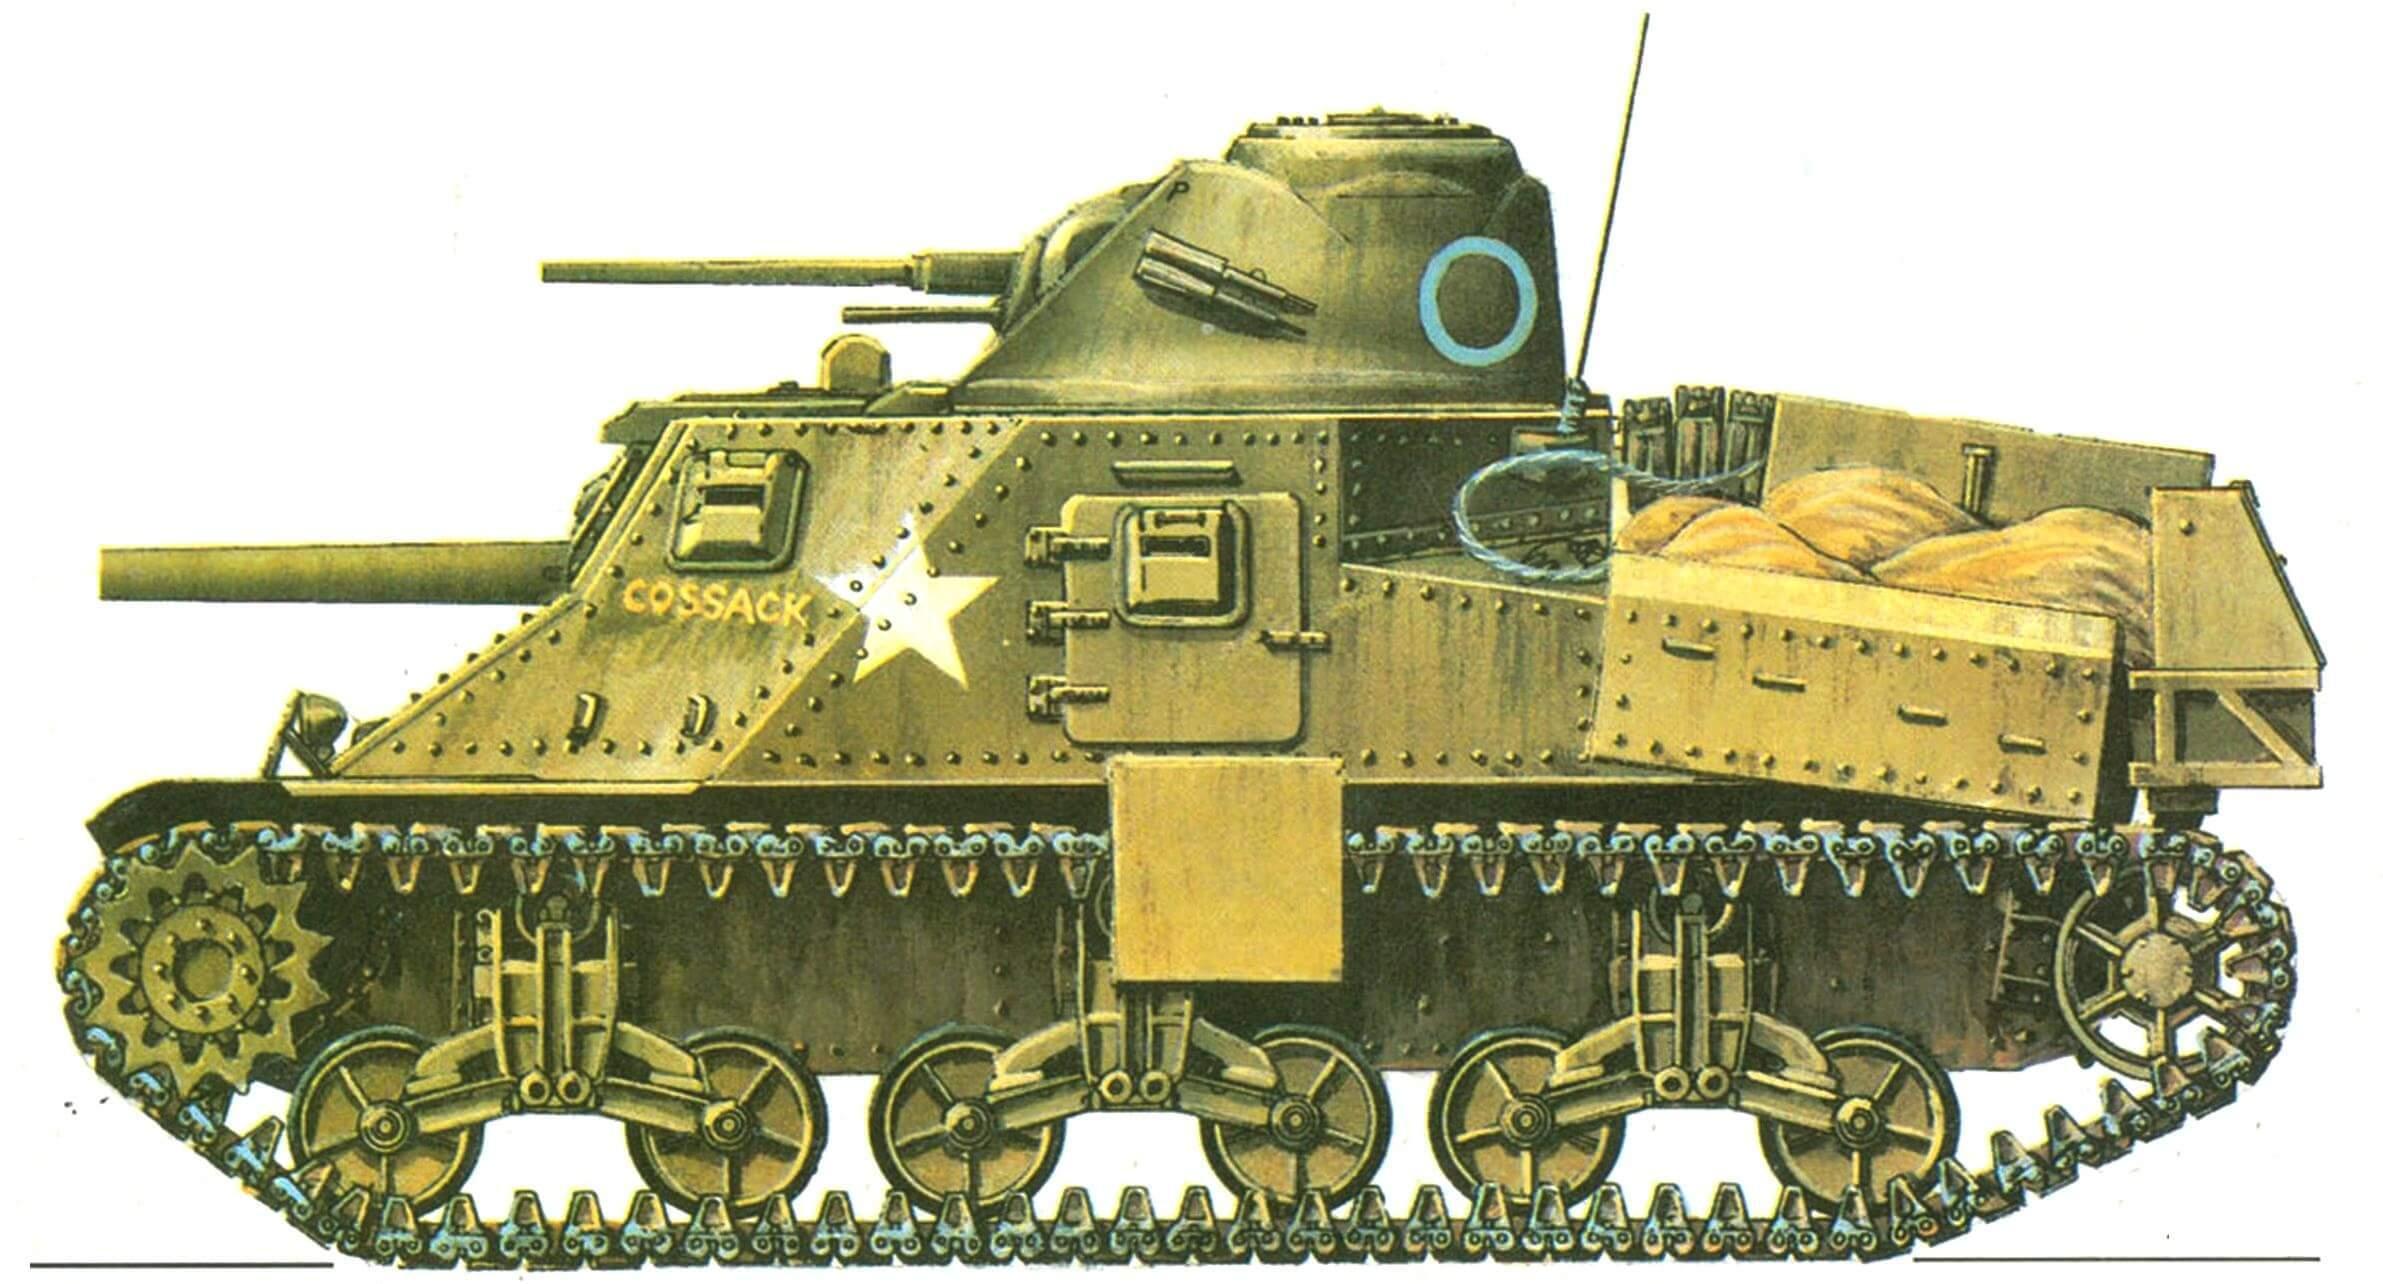 Lee I. Эскадрон «С» 150-го полка Королевского танкового корпуса (С Squadron, 150th Regiment, Royal Armoured Corps), Бирма, март 1945 года.